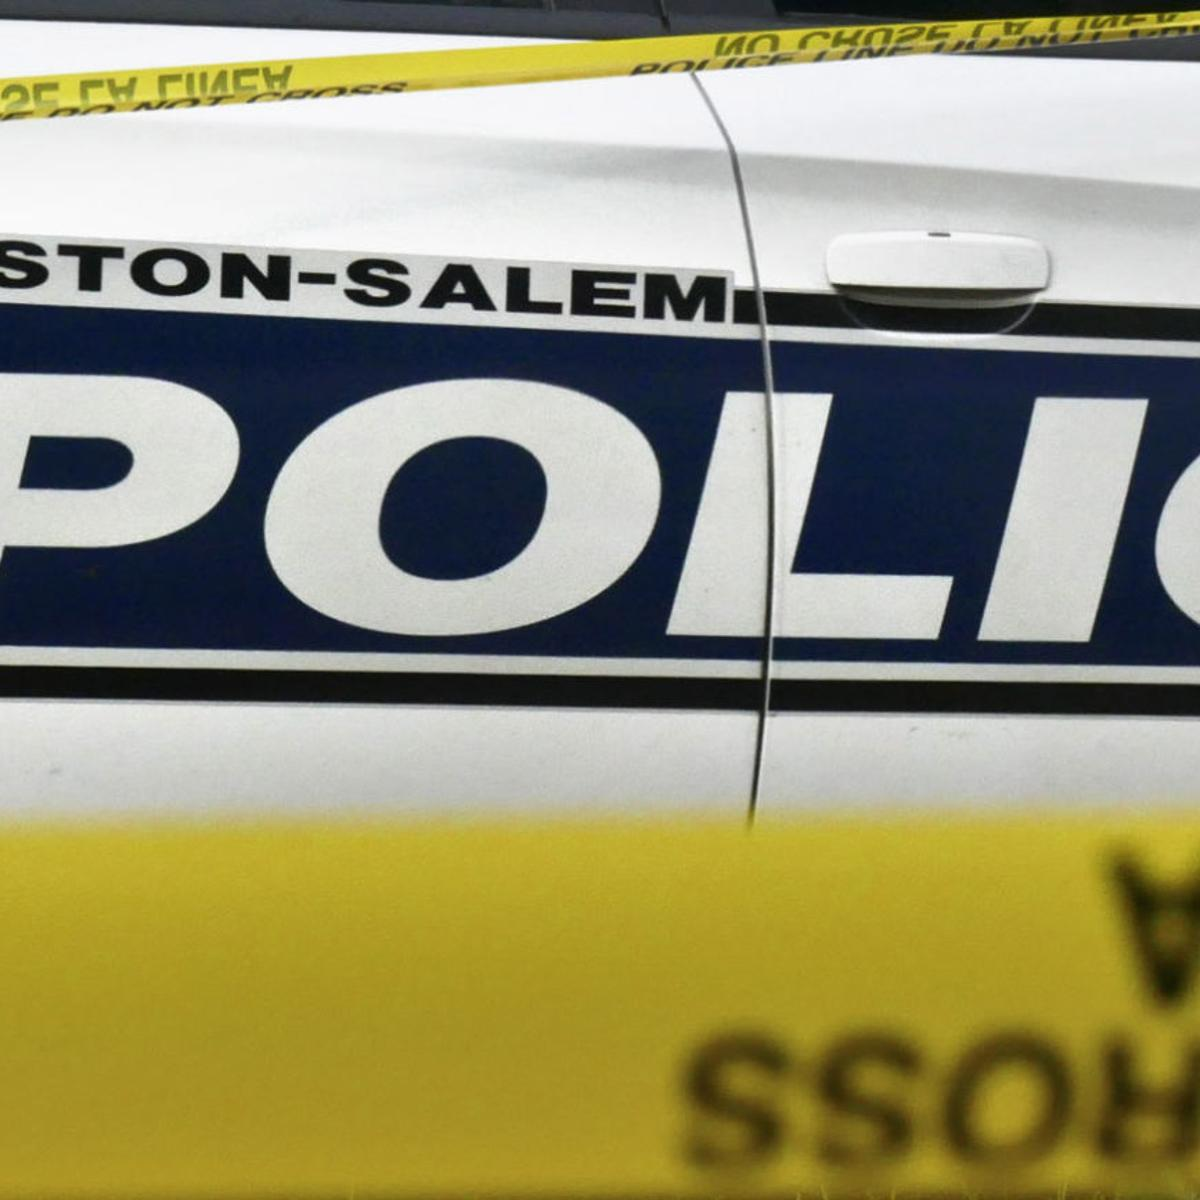 1 man shot in brawl at Winston-Salem sweepstakes parlor